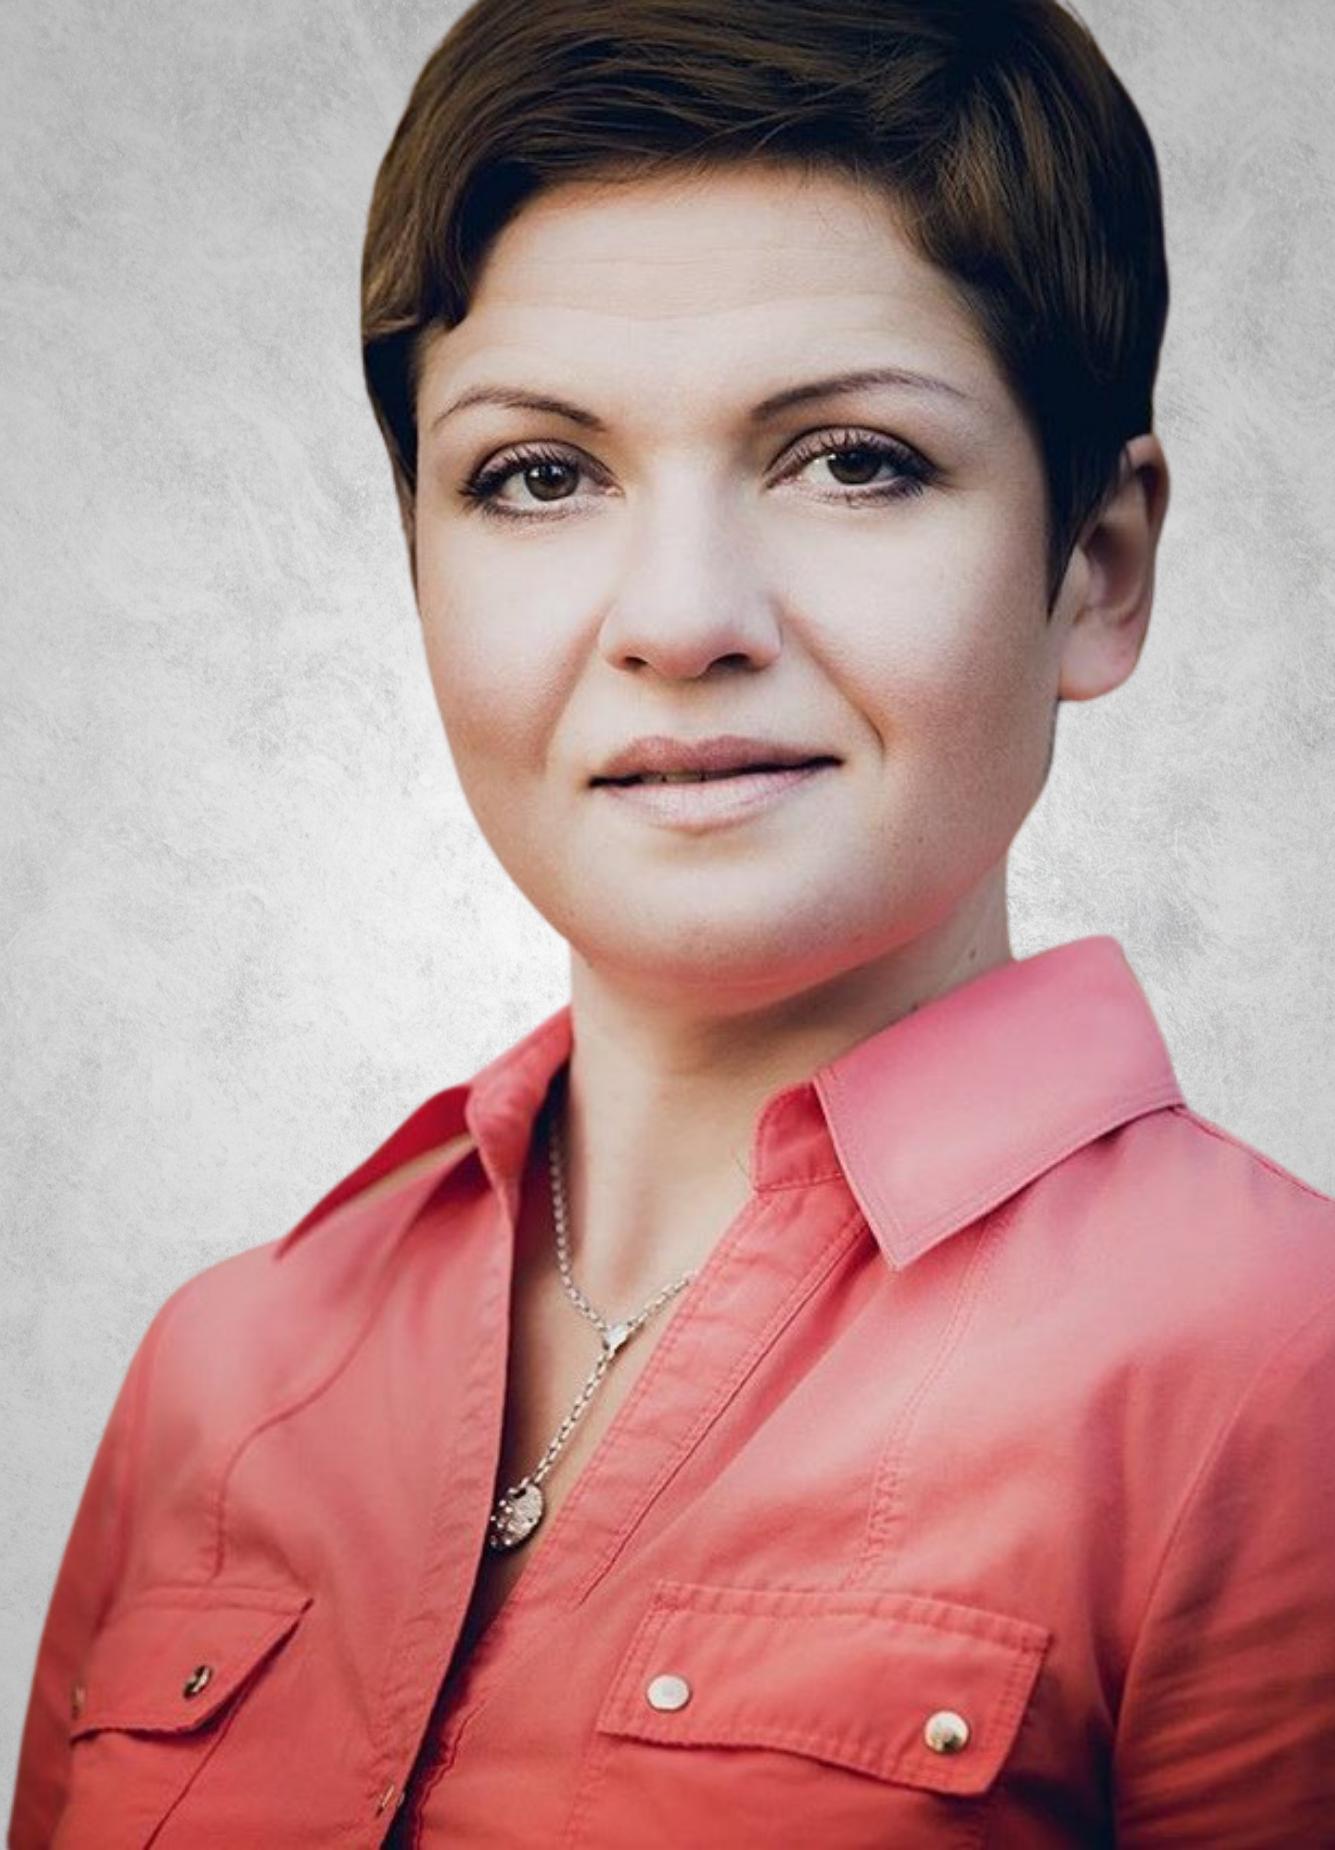 Dr. Kutsenko